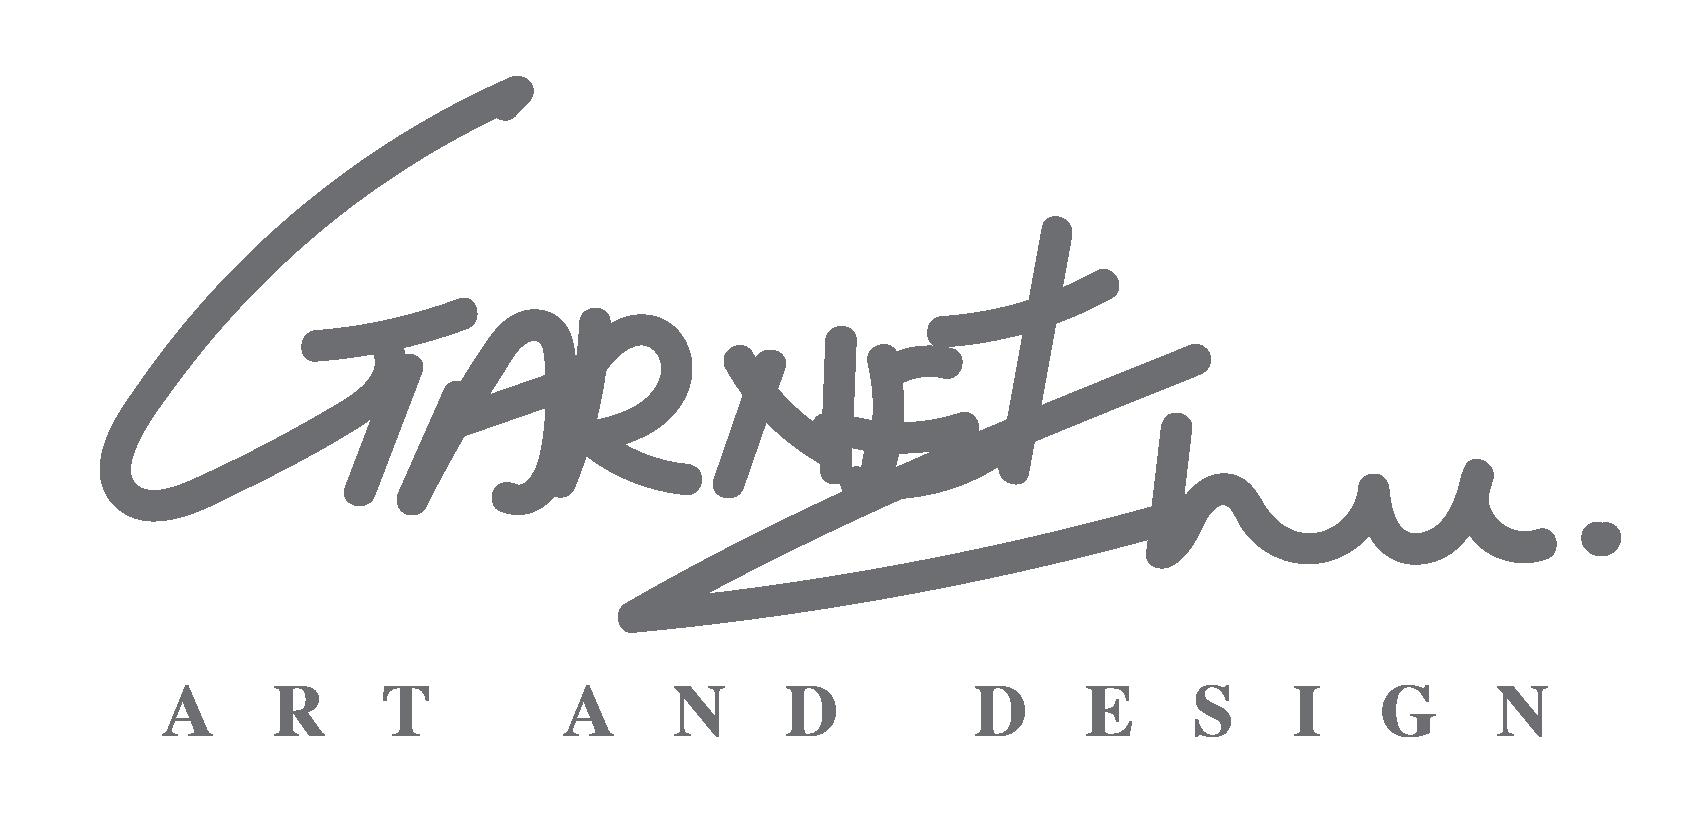 Garnet Chu